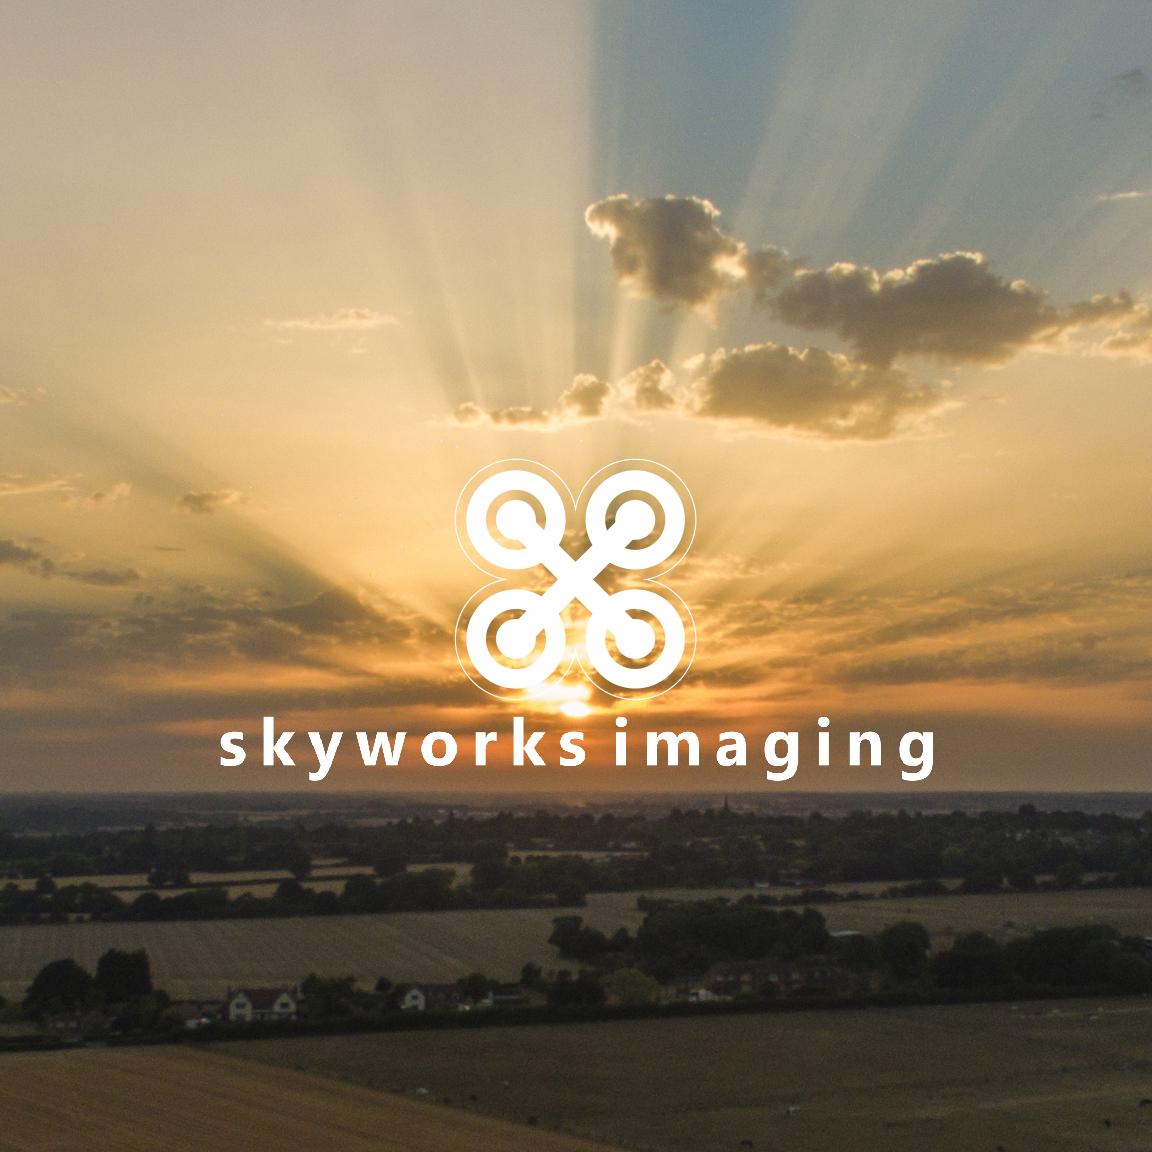 skyworks imaging